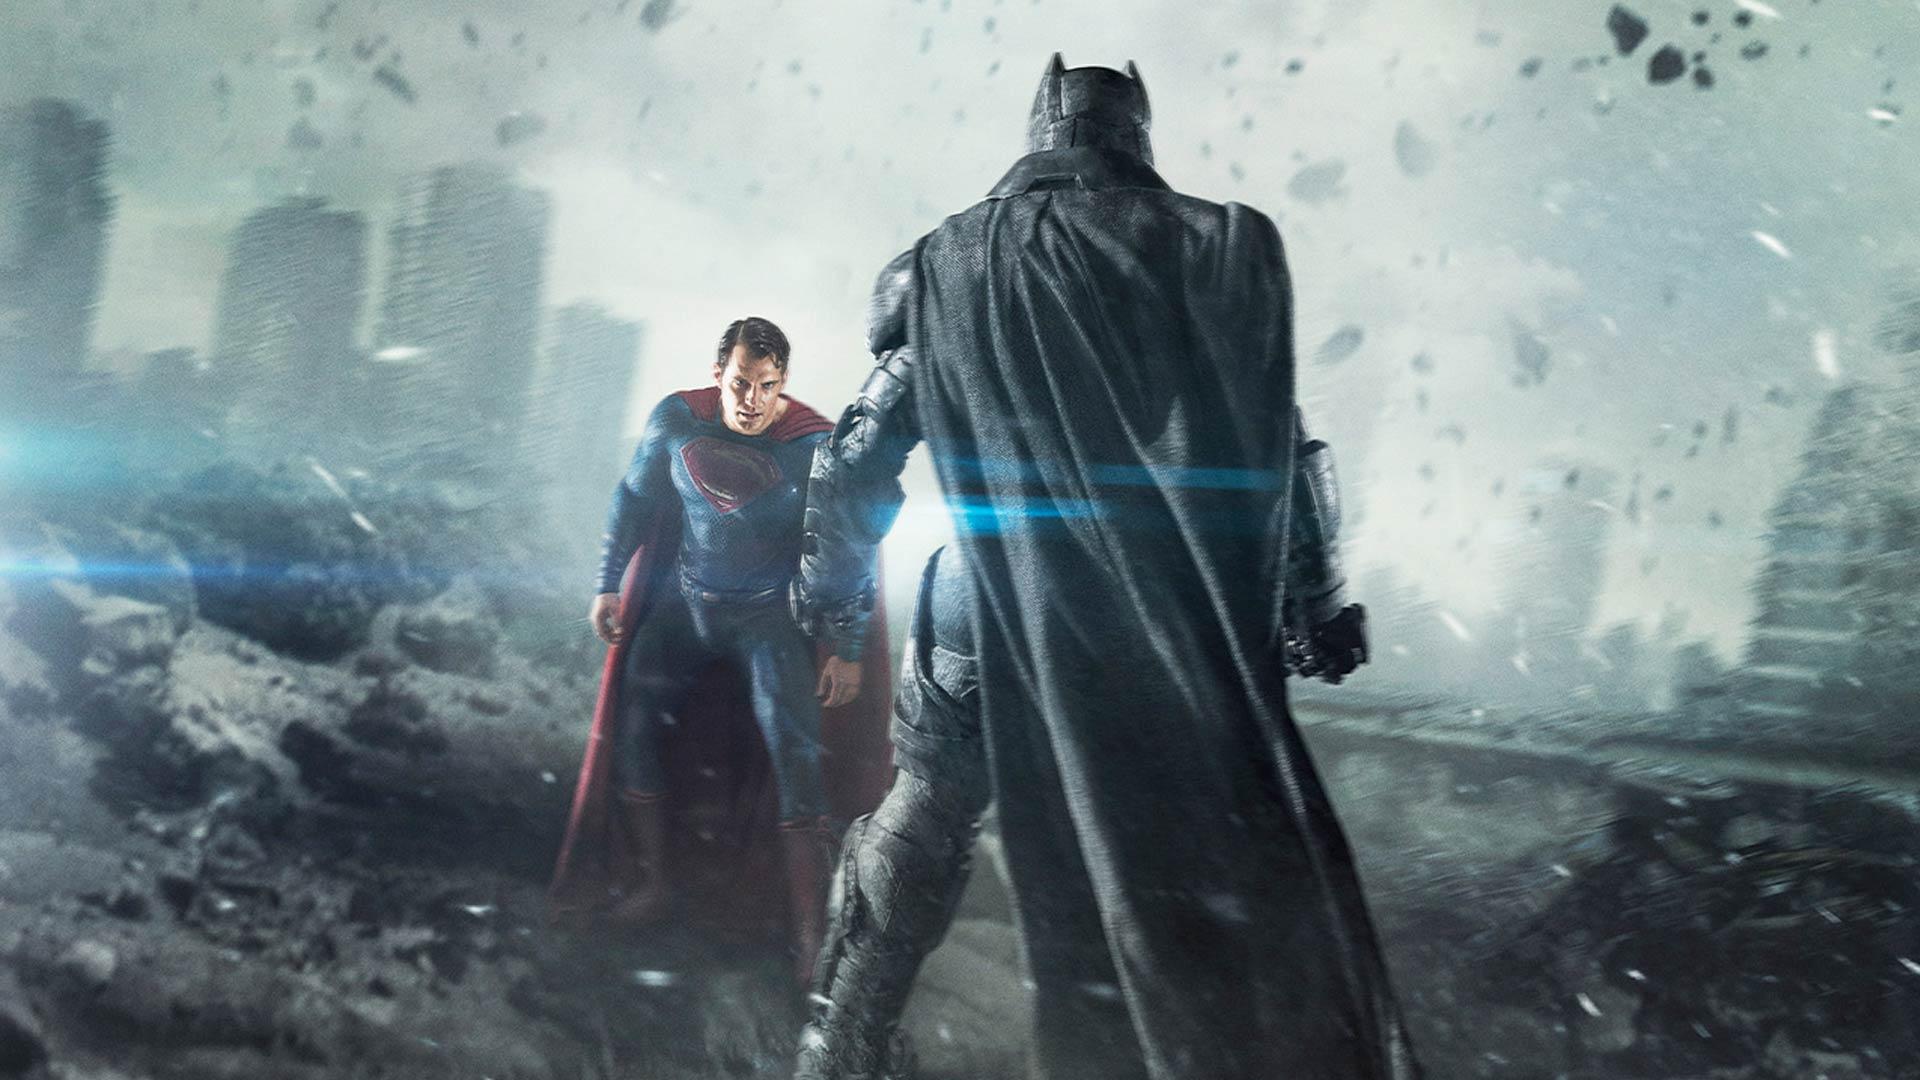 HQ Batman Vs Superman Wallpapers | File 191.32Kb